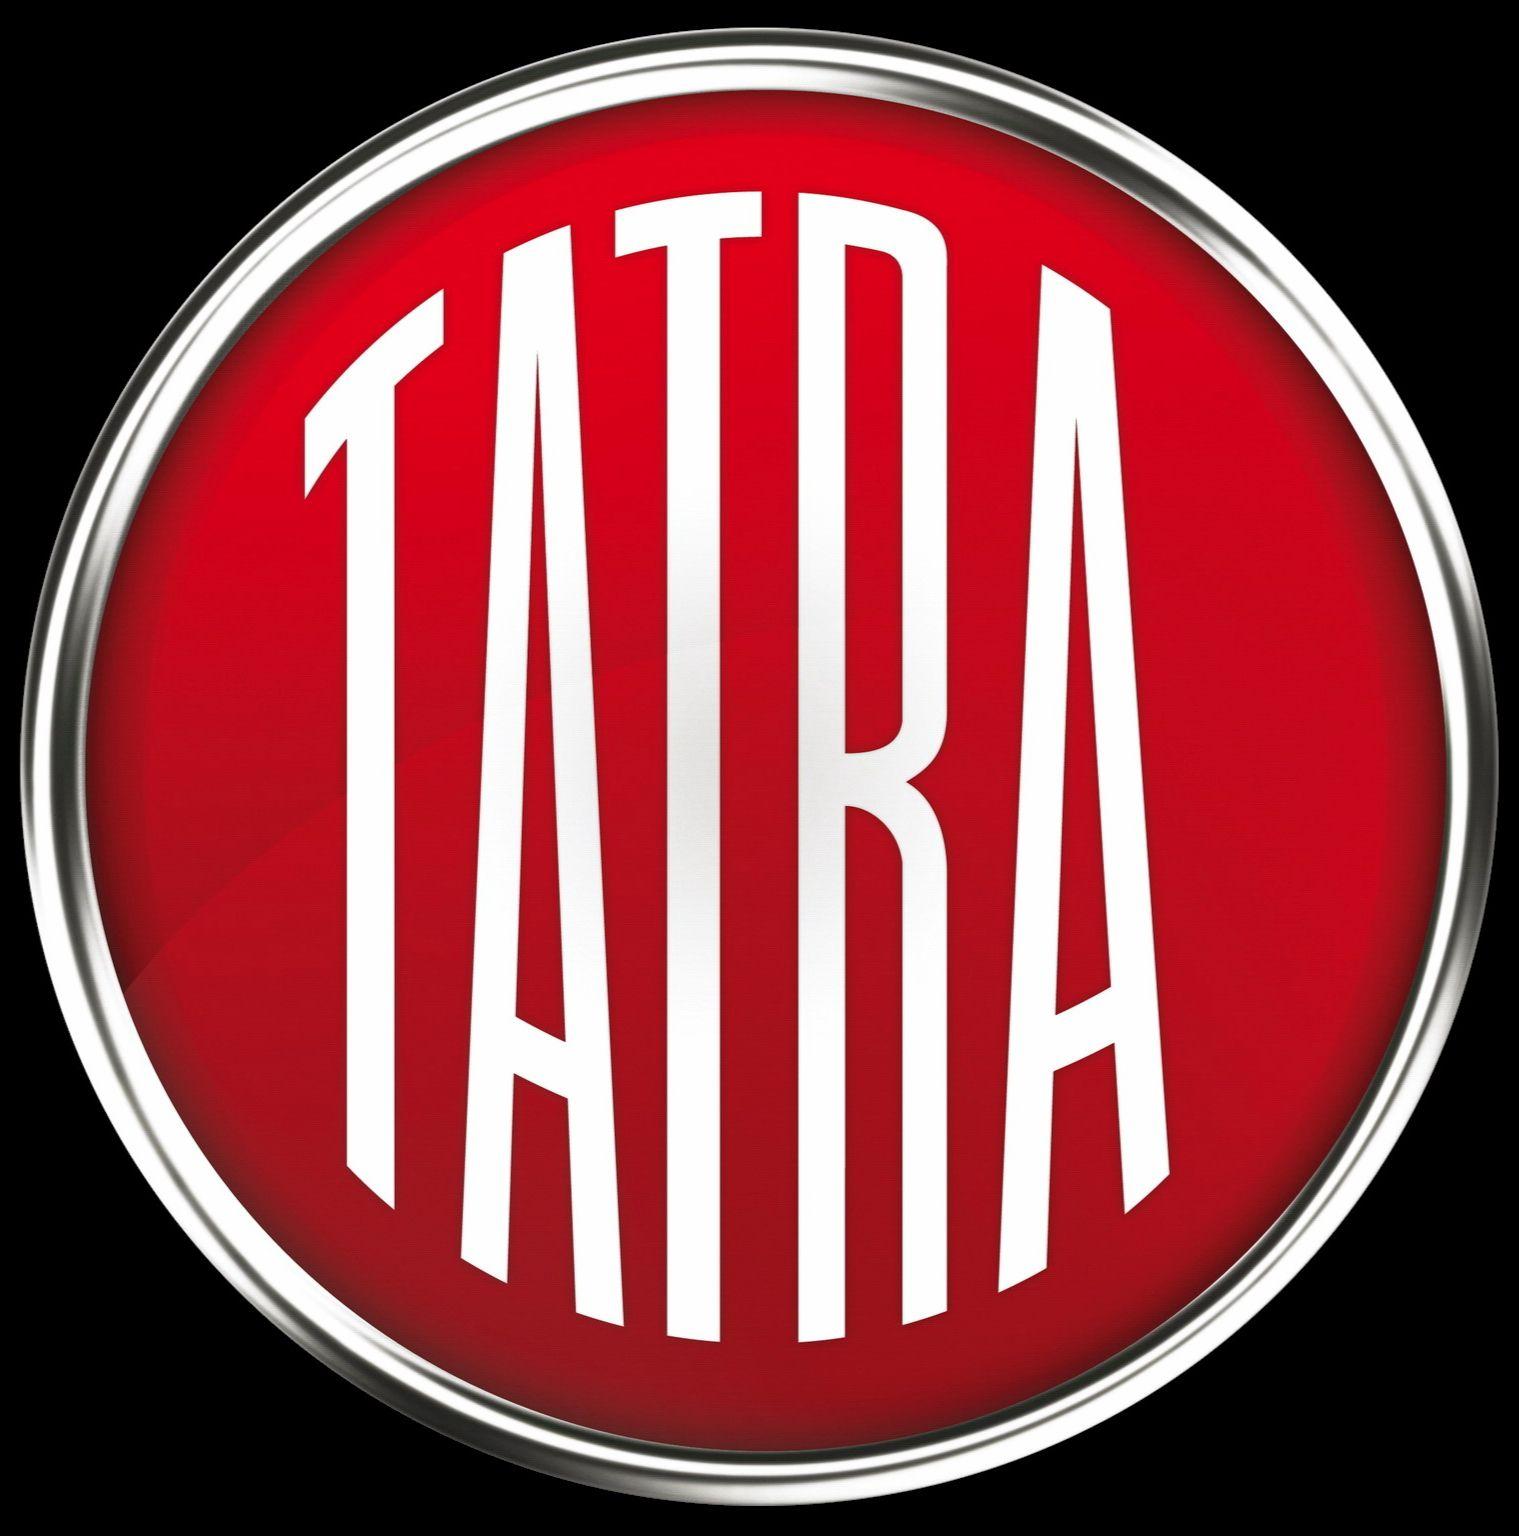 Tatra logo Car logos, Car brands logos, Motor logo